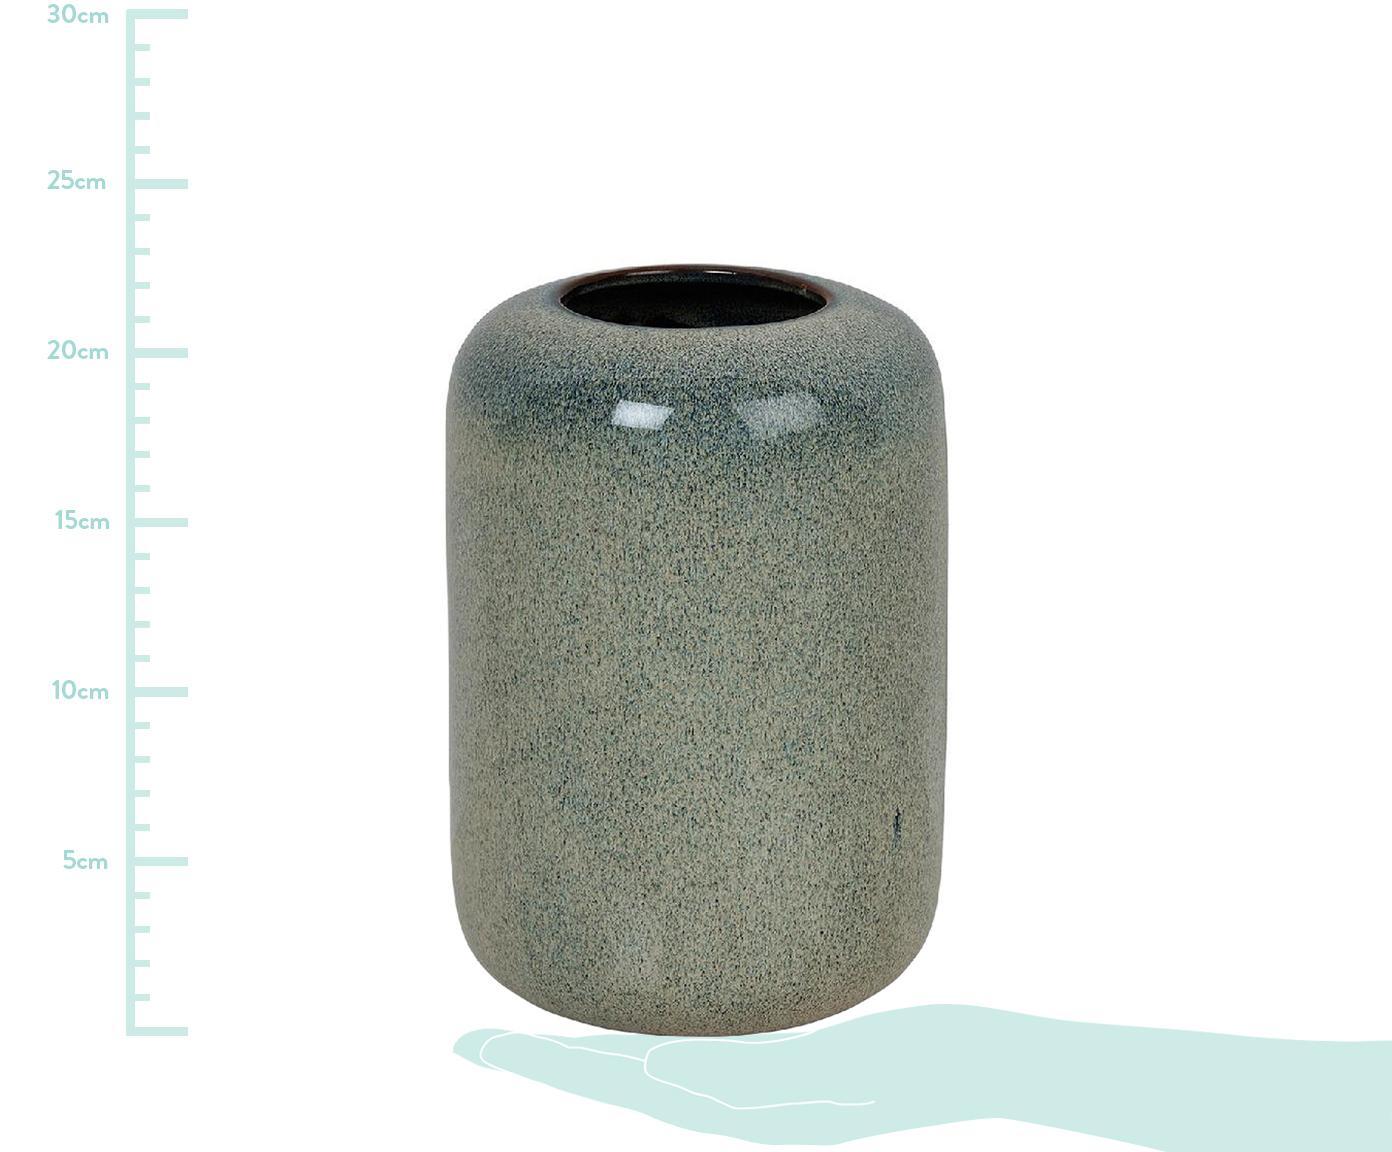 Vase Blue Ocean aus Keramik, Keramik, Blaugrün, Ø 15 x H 20 cm